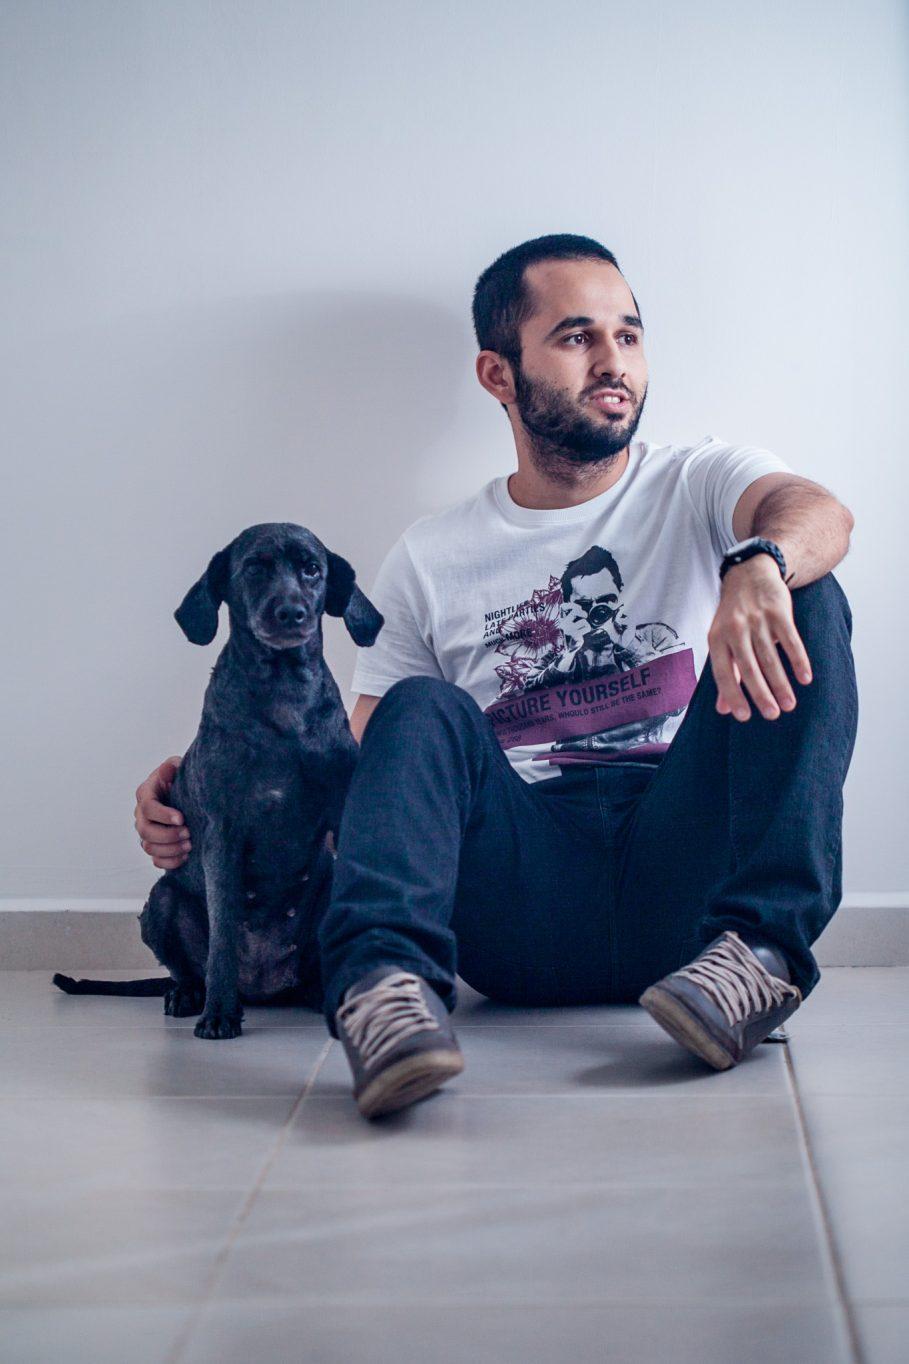 Fotografo Paulo Lima e sua mascote Bundê